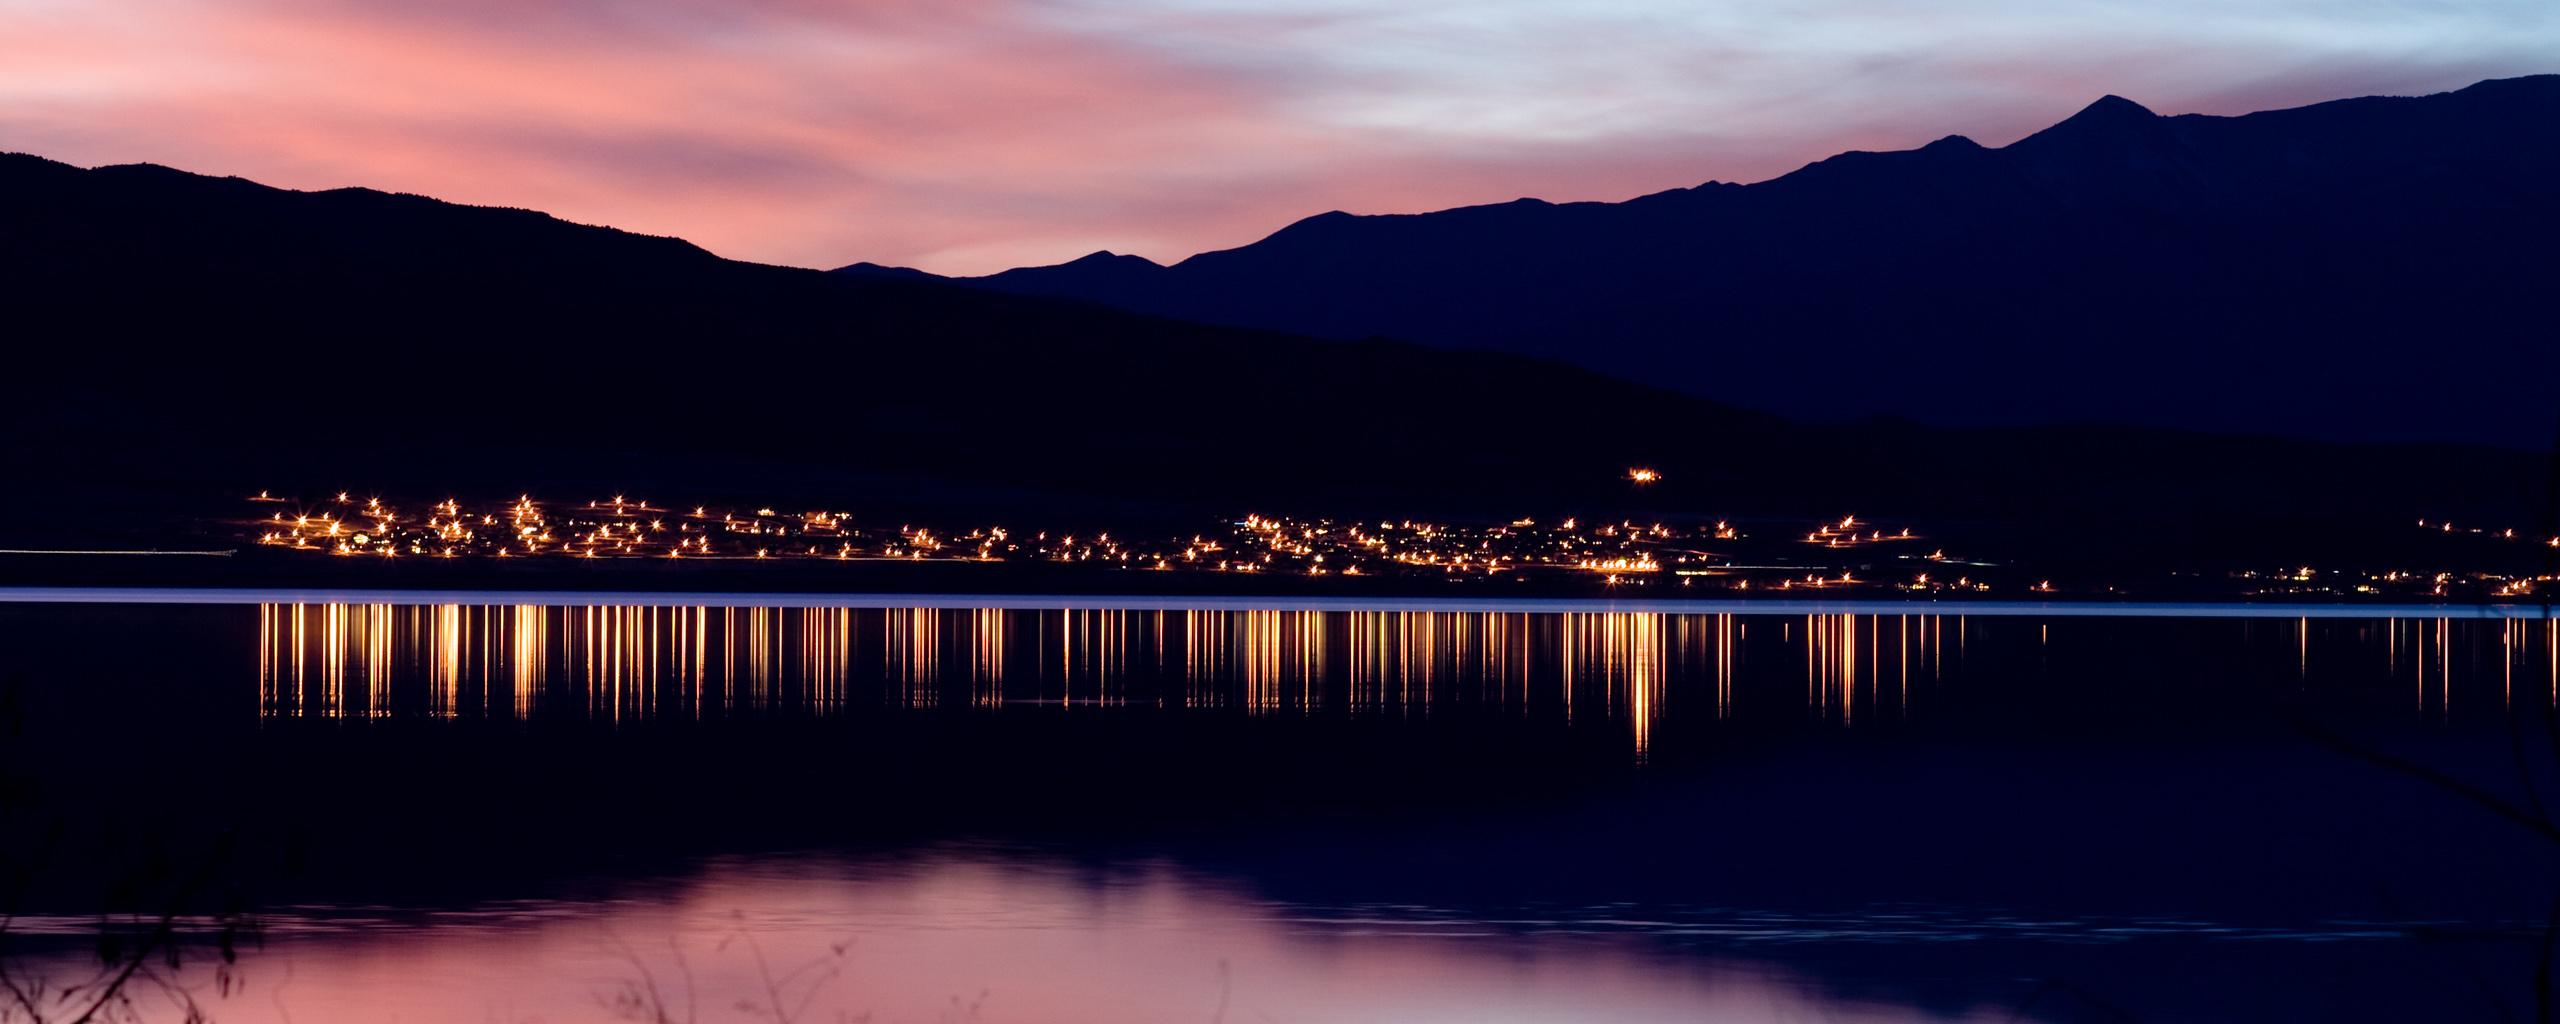 огни город море сумерки lights the city sea twilight  № 2659514  скачать